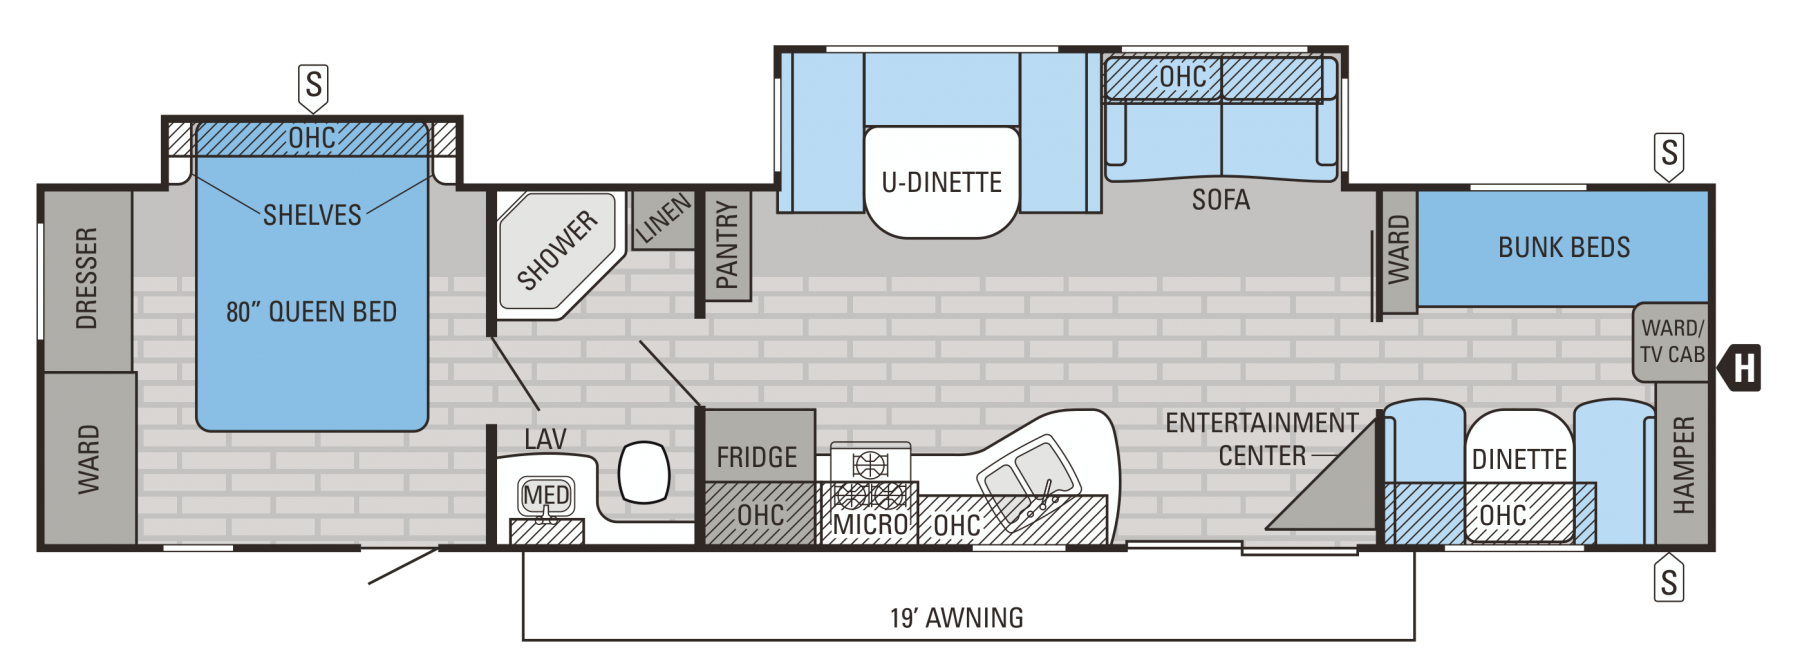 38BHDS Floorplan